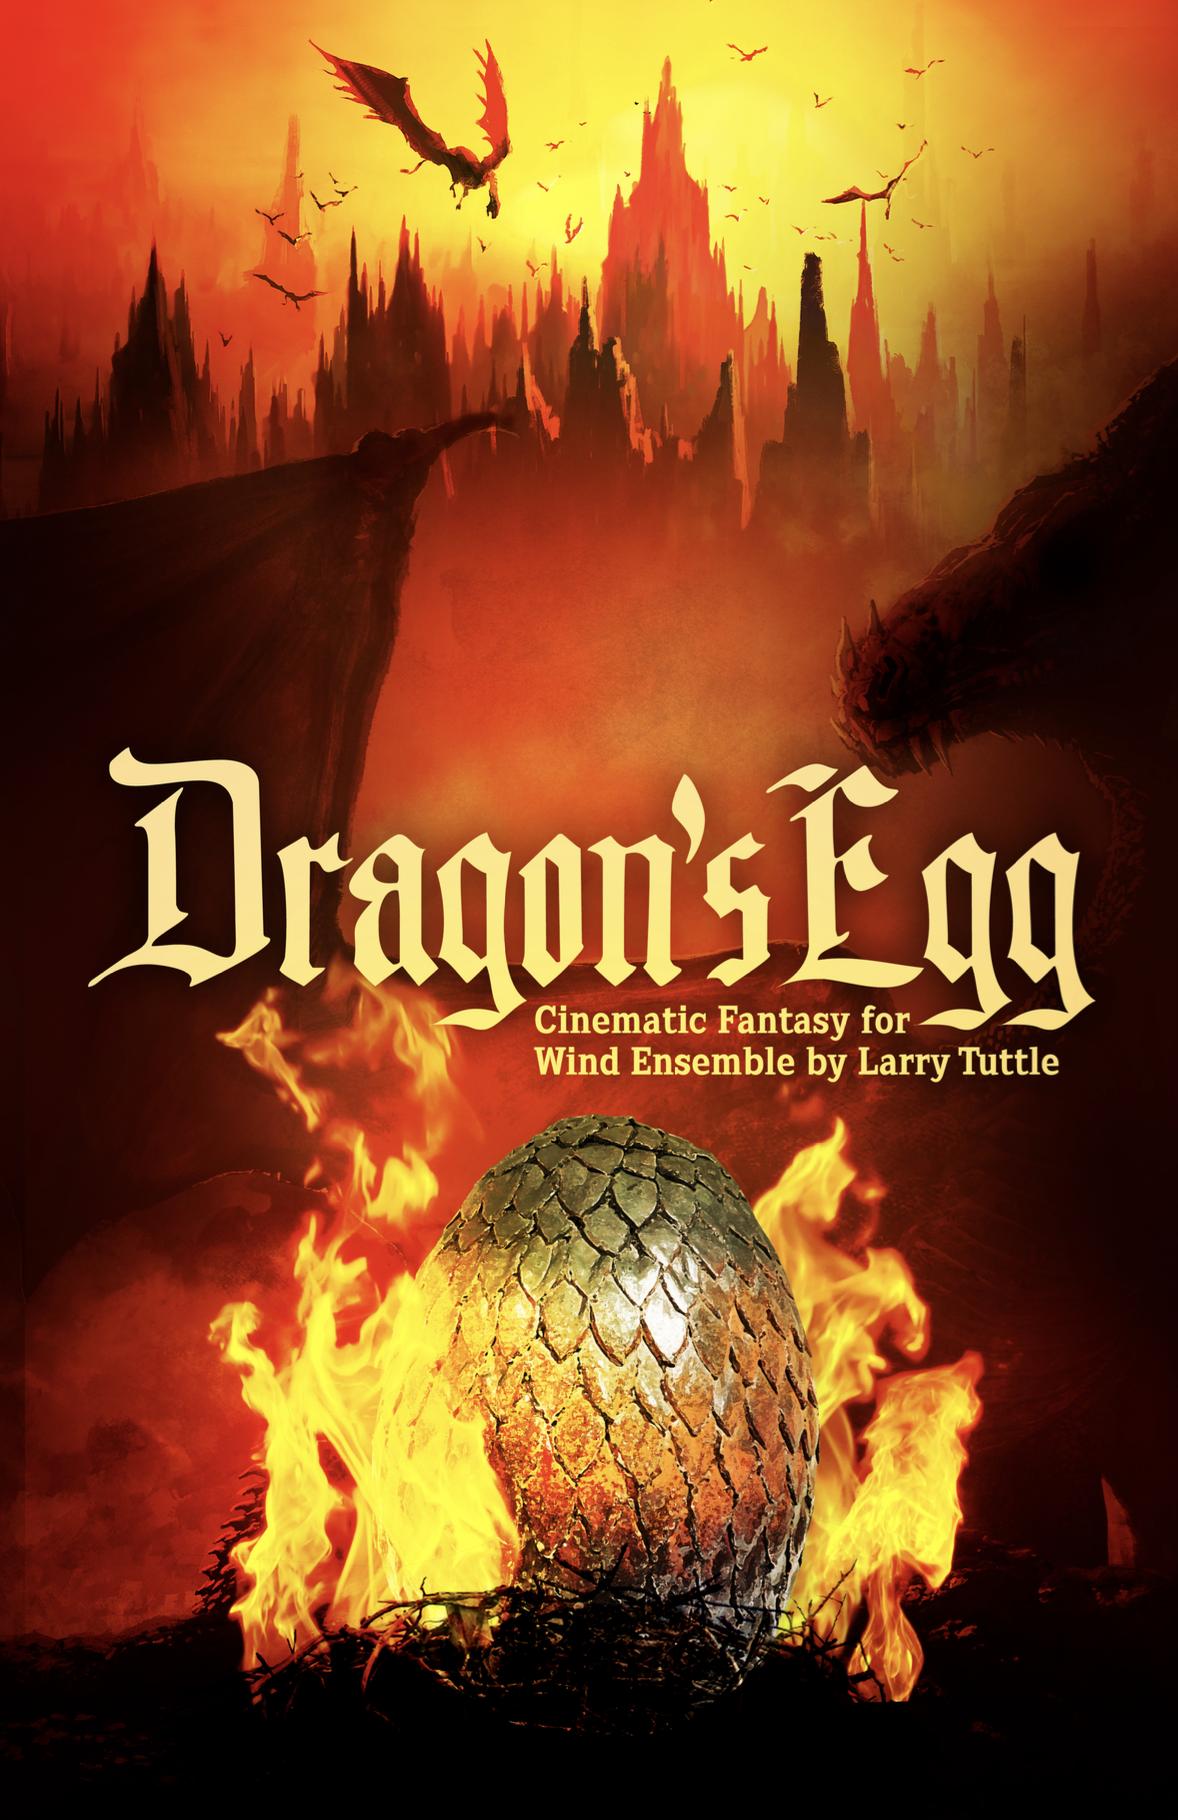 Dragon's Egg by Larry Tuttle